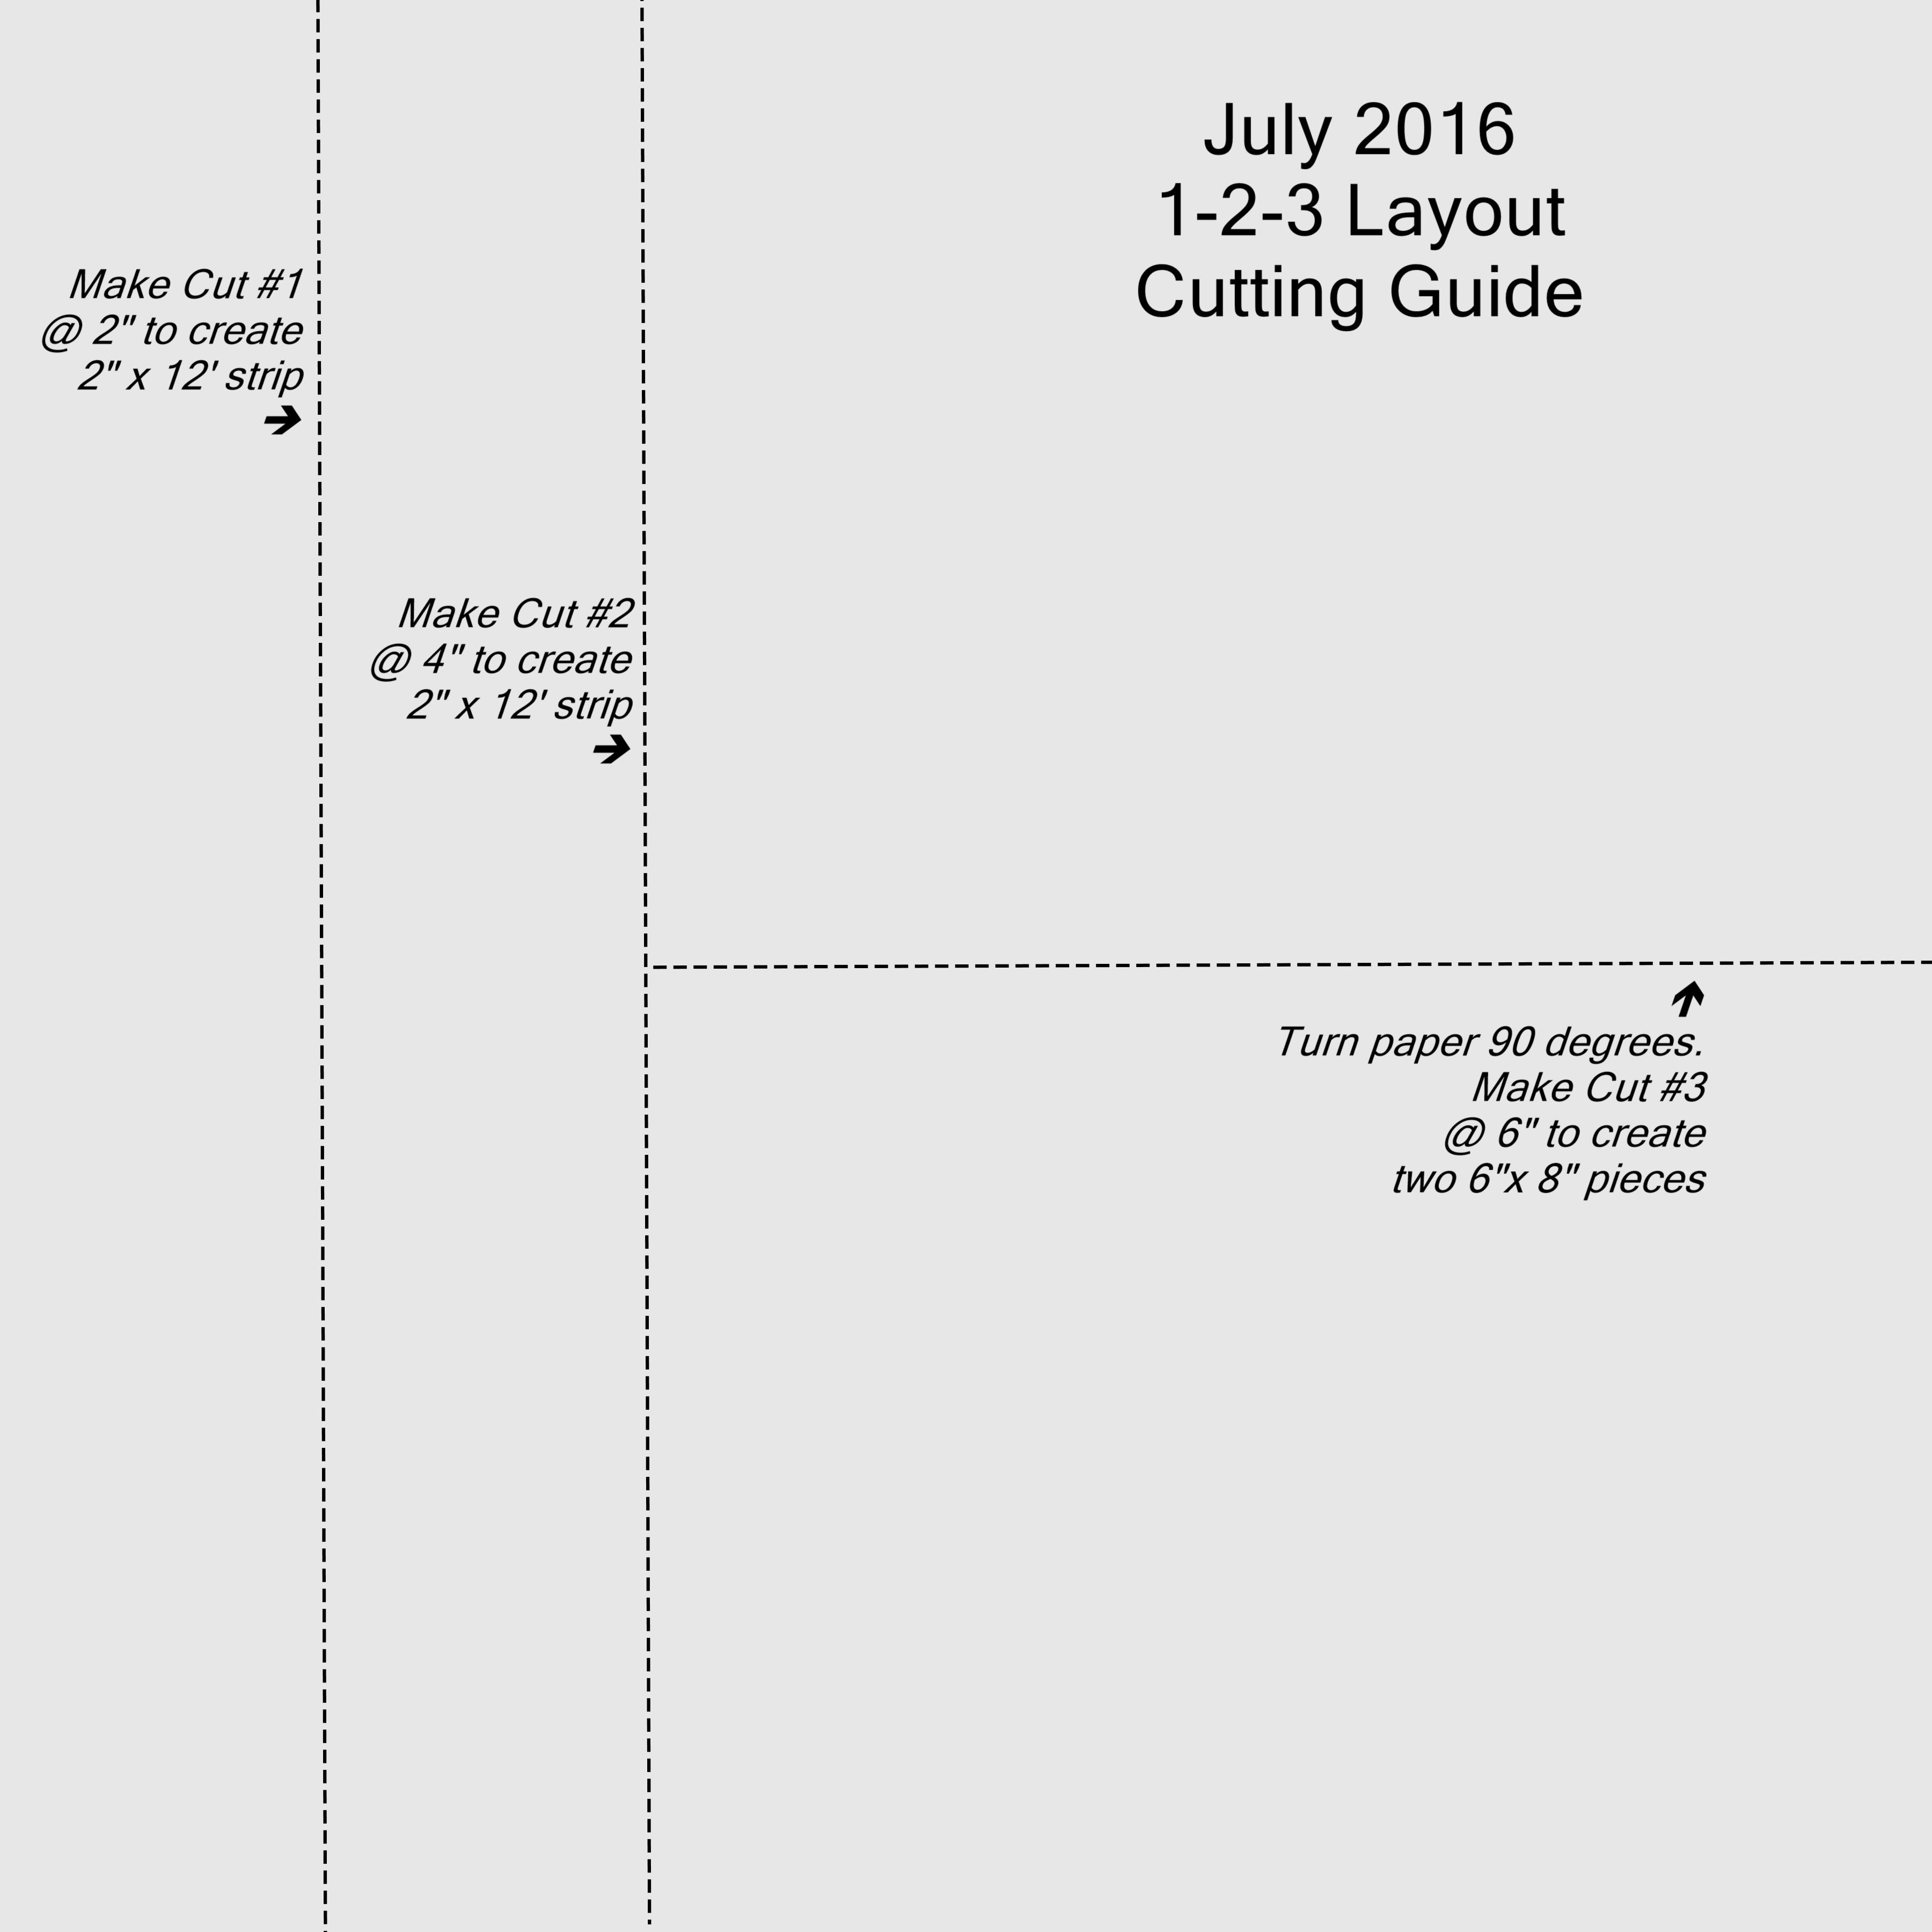 July 1-2-3 Cutting Guide